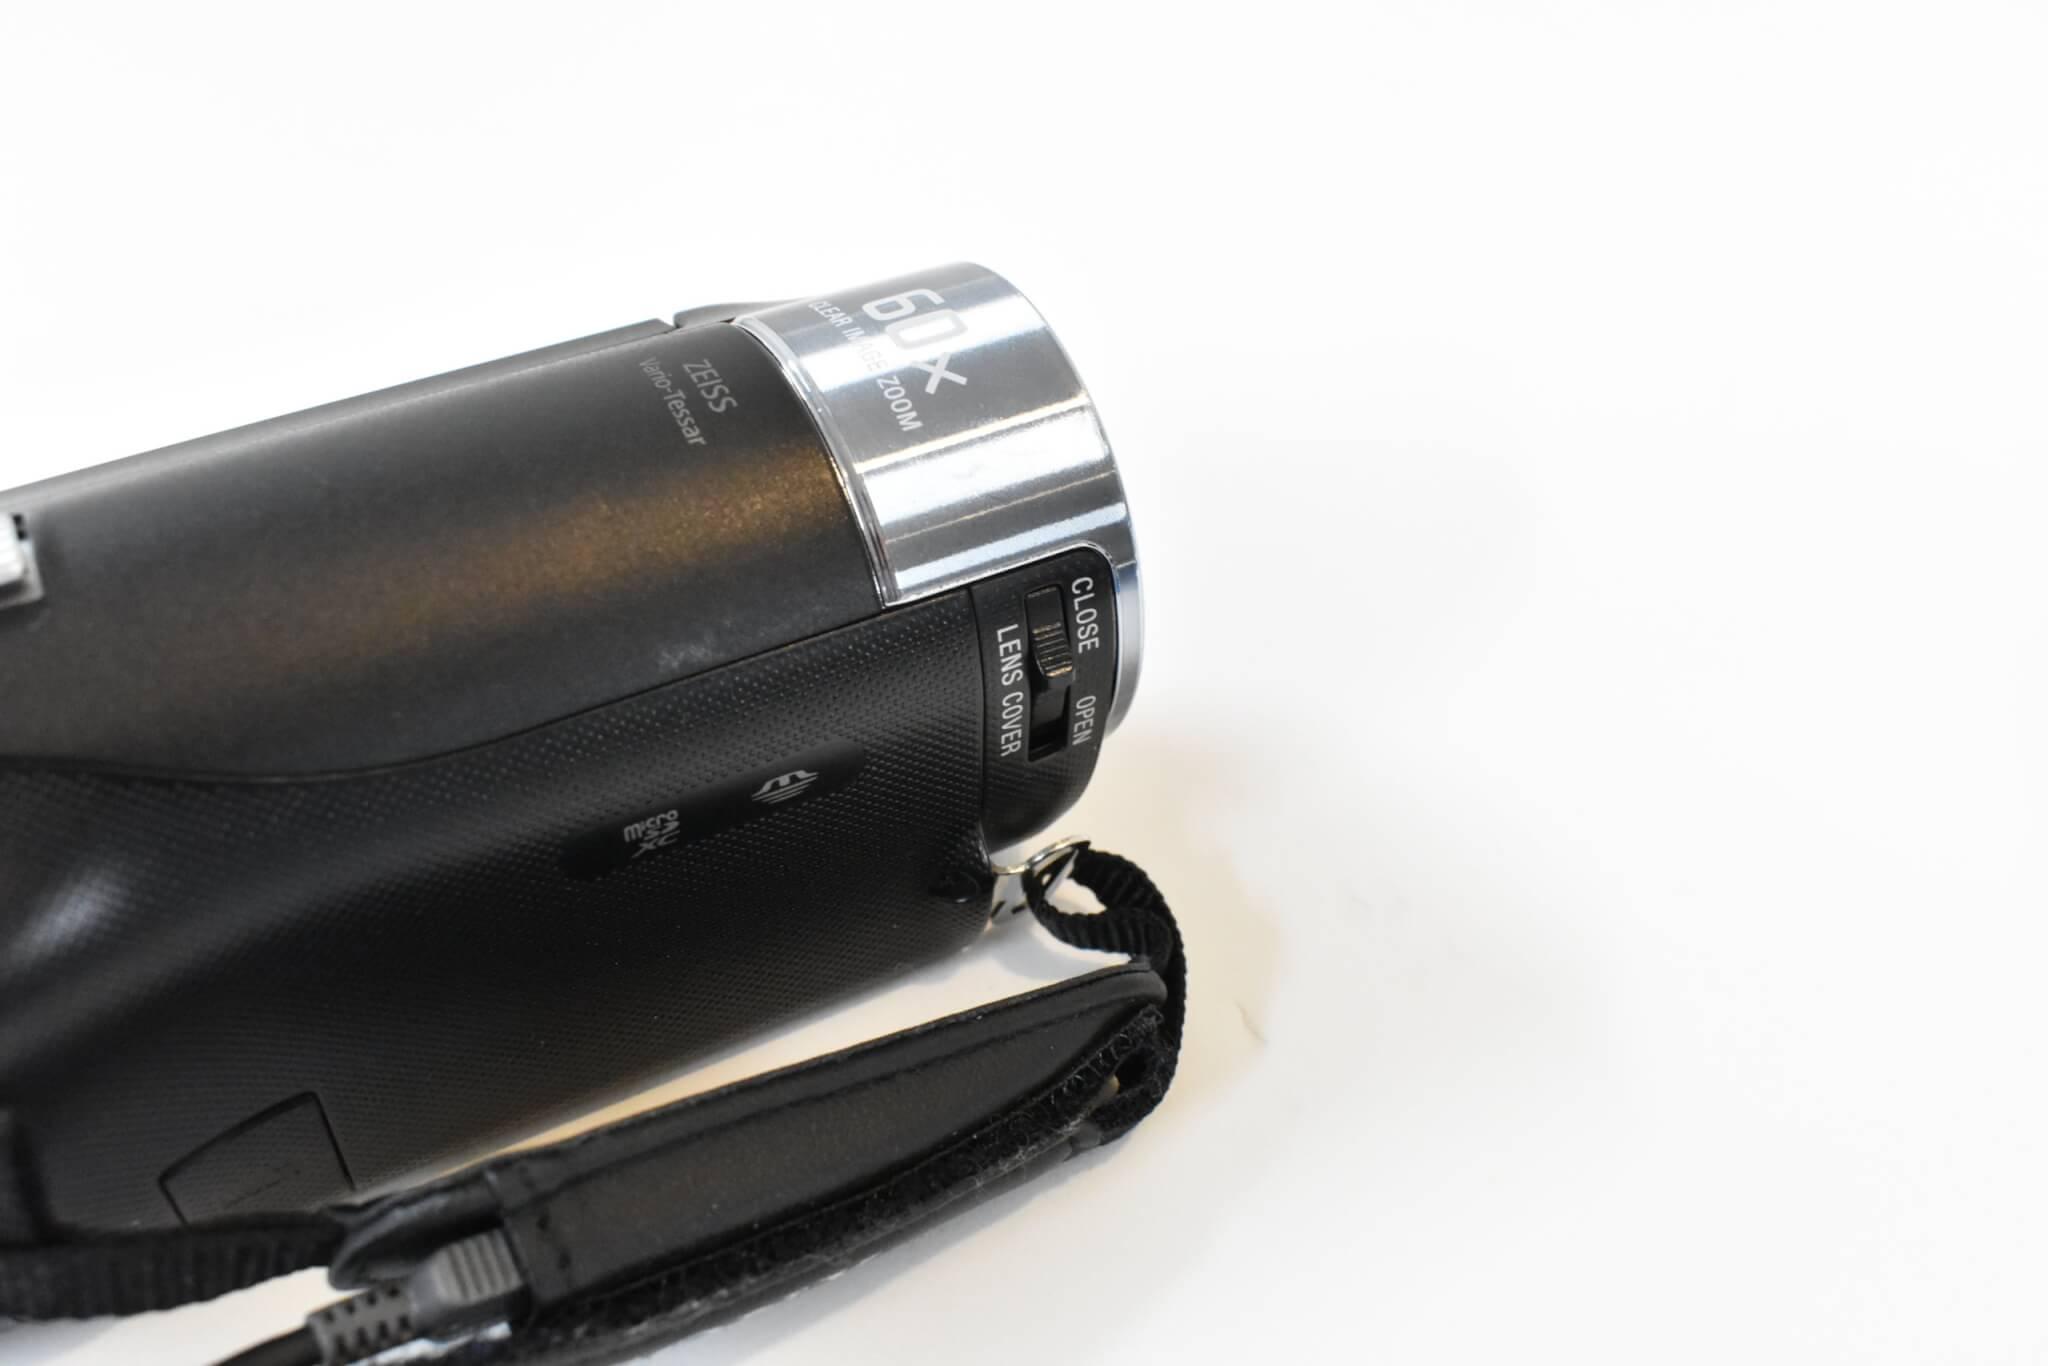 SONYハンディカム 最新全7機種を写真付きで紹介 HDR-CX470